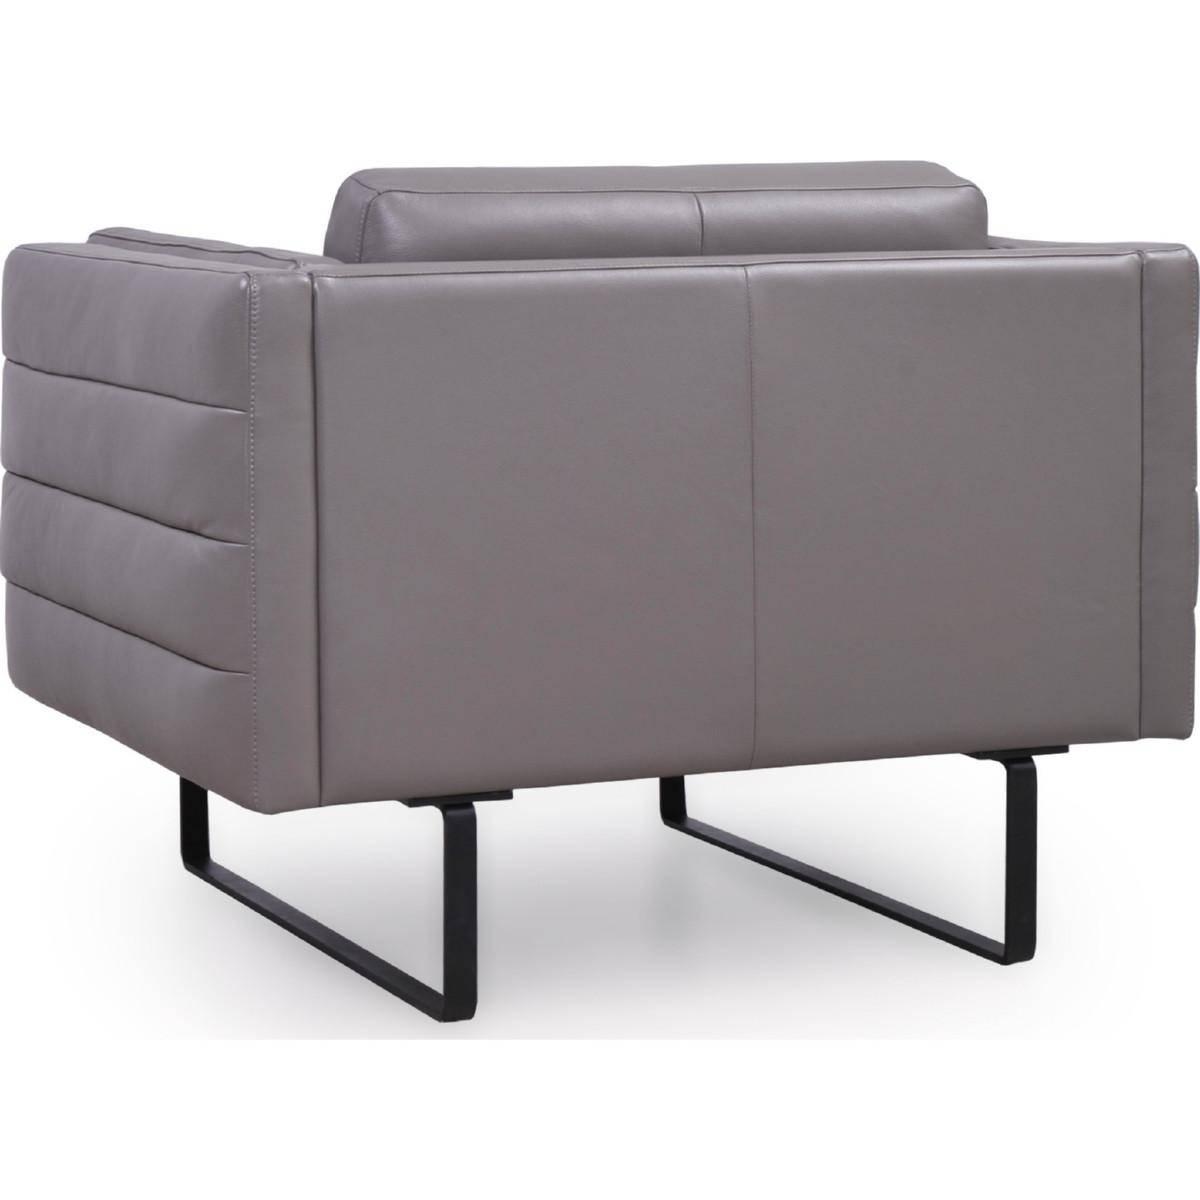 Buy Moroni Orson 582 Sofa Armchair Set 2 Pcs In Gray, Top Regarding Orsen Tv Stands (View 8 of 20)